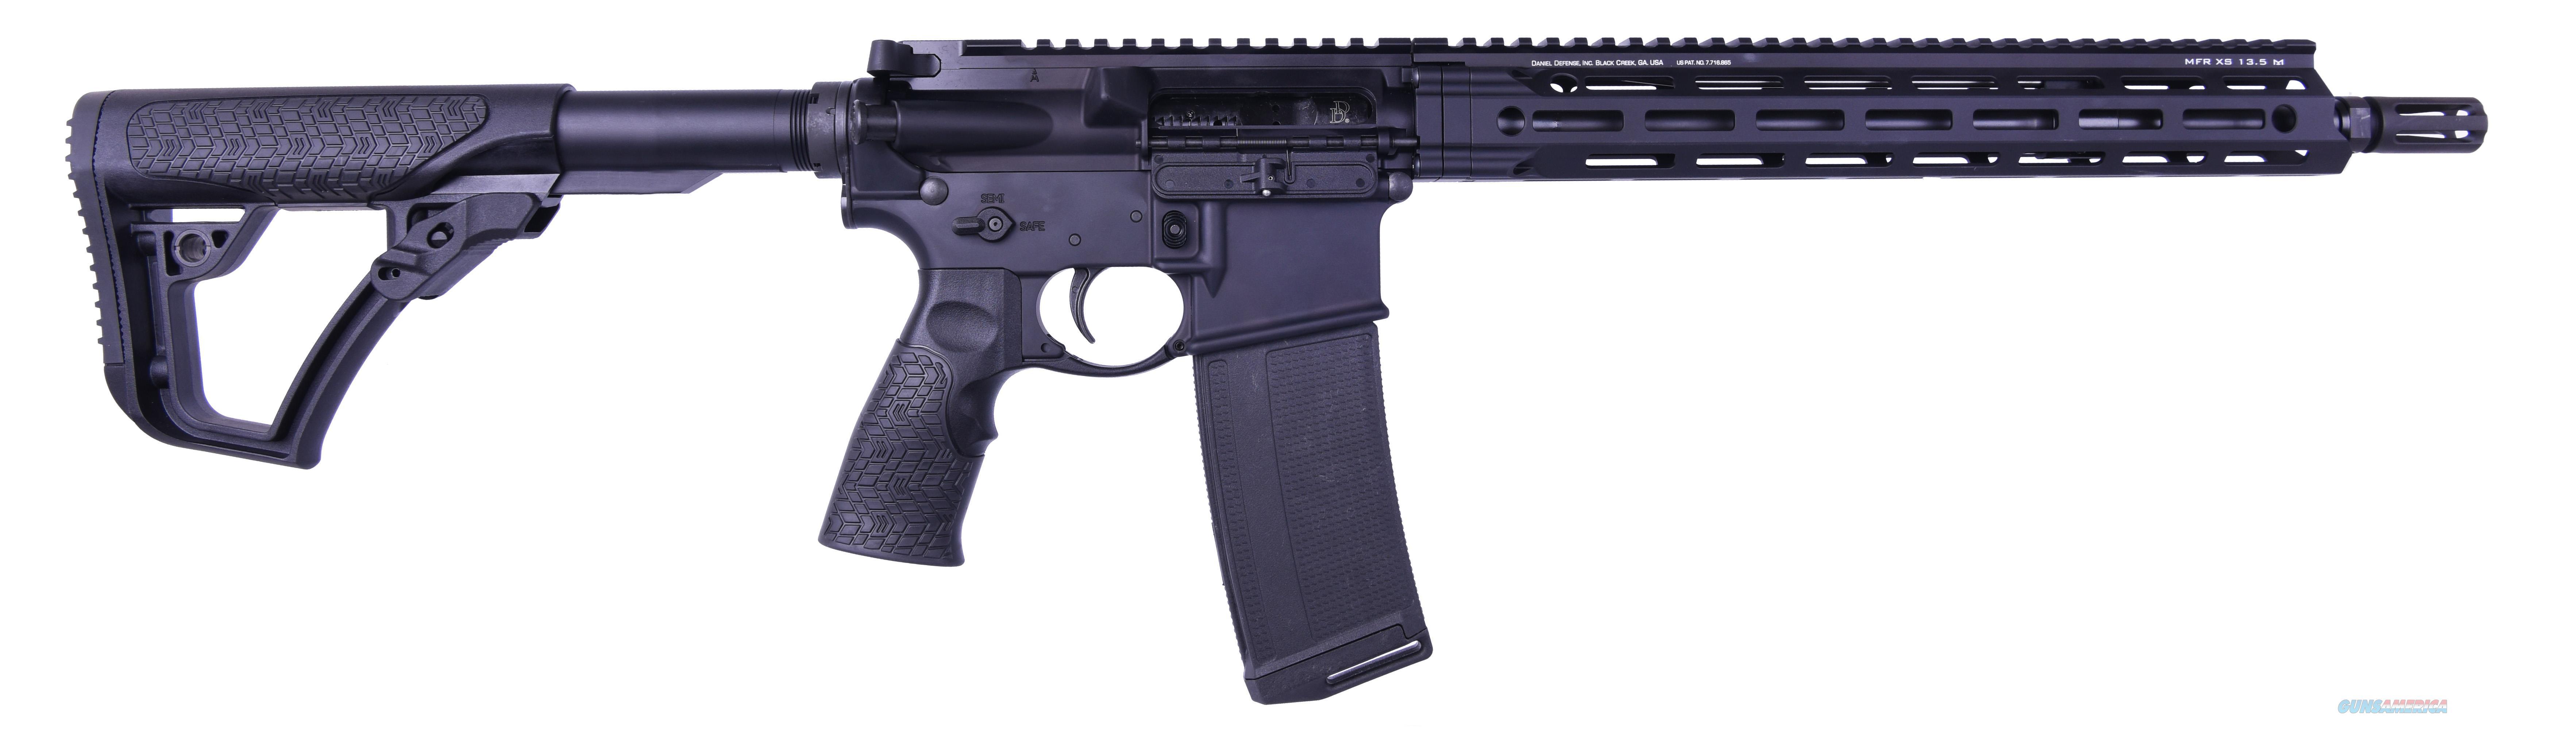 "Daniel Defense Ddm4v7 Slw 5.56 14.5"" 30Rd 02-128-15049-047  Guns > Rifles > D Misc Rifles"